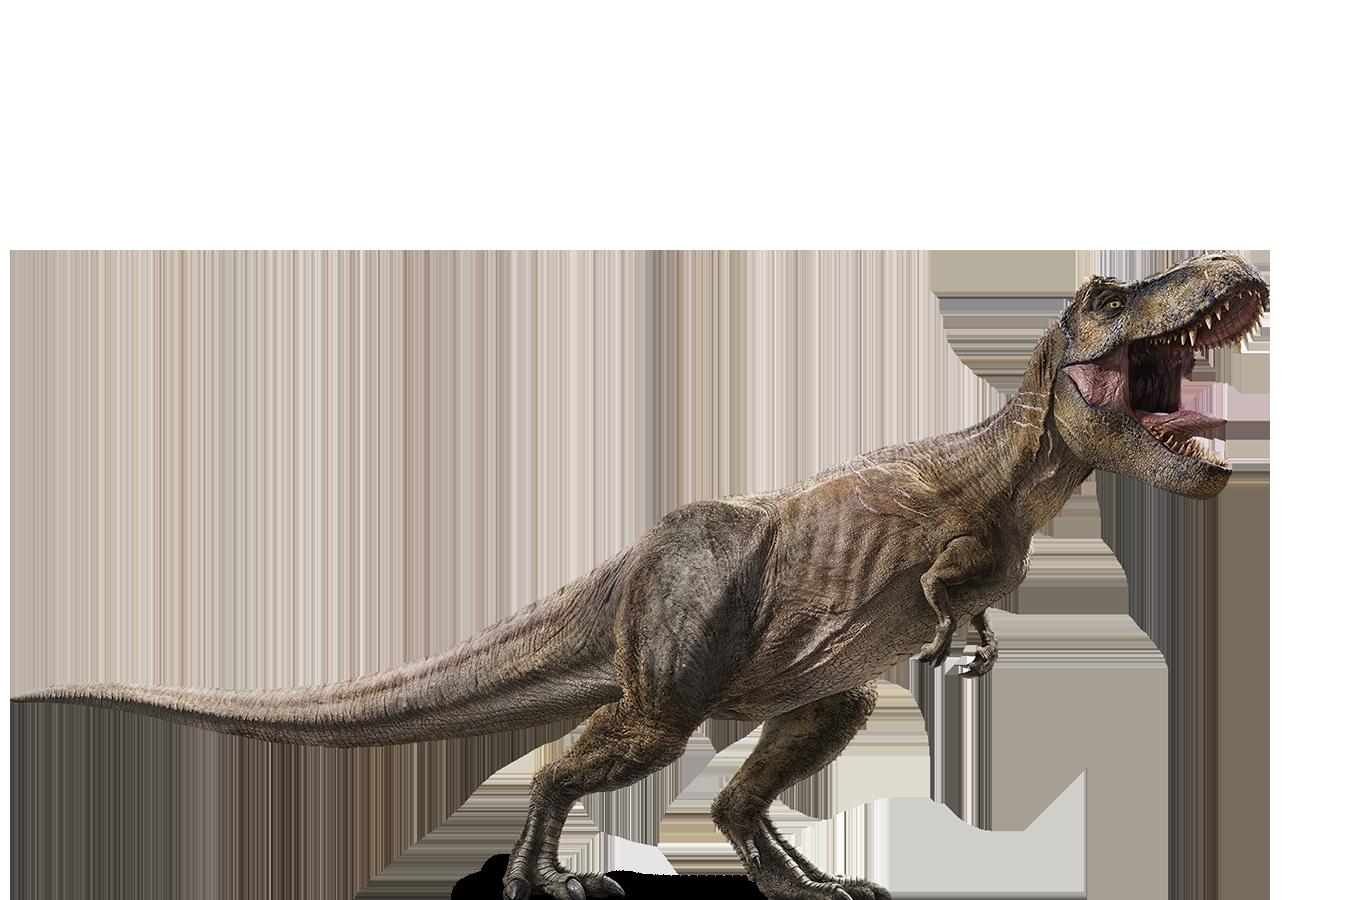 Jurassic Park PNG HD Image.